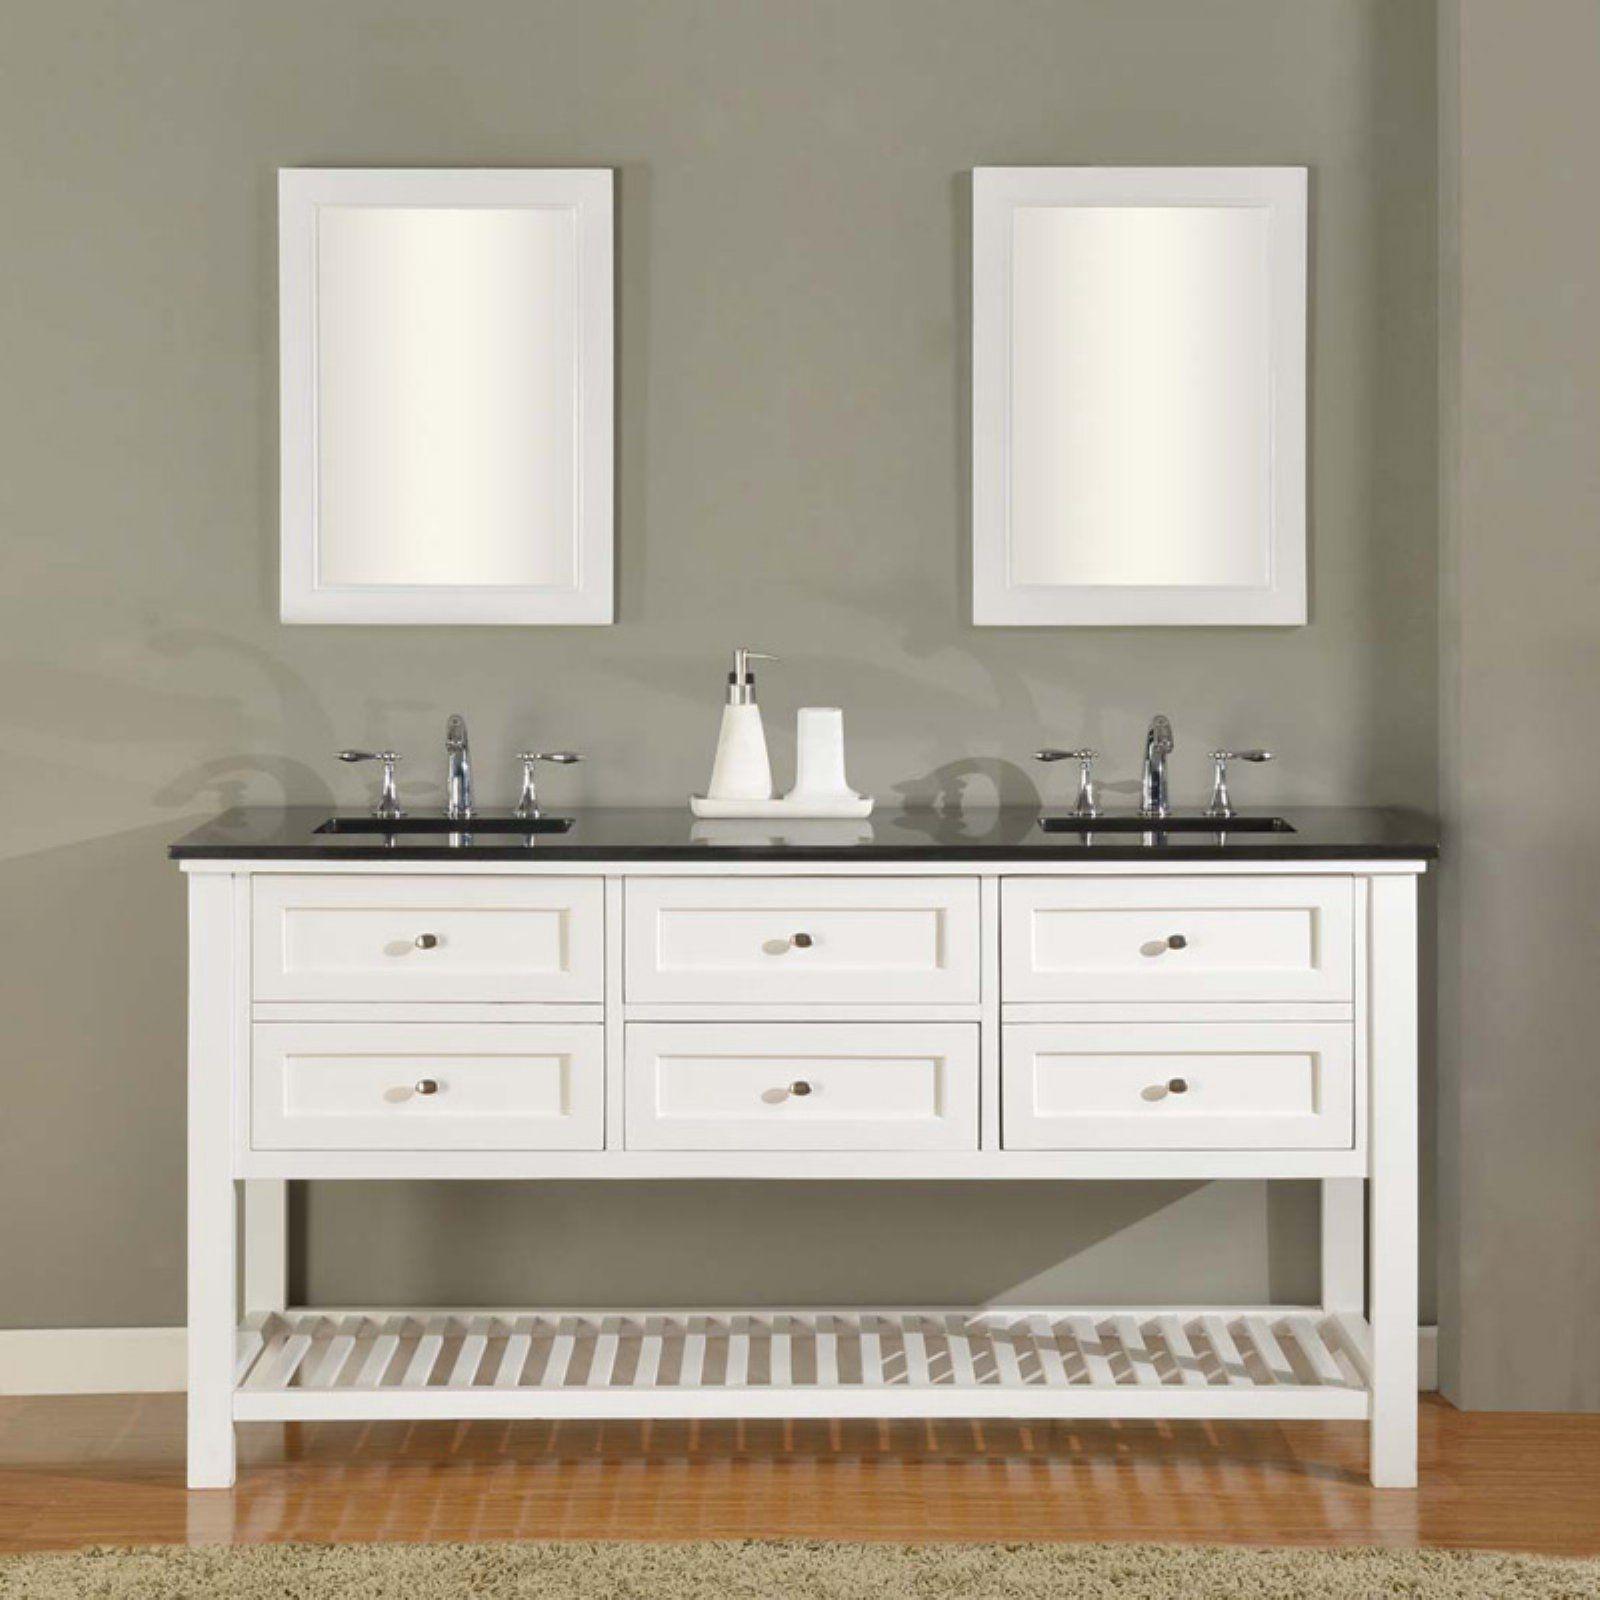 direct vanity sink mission spa collection 70 in double bathroom rh pinterest com 70 bathroom vanity cabinet 70 bathroom vanity single sink